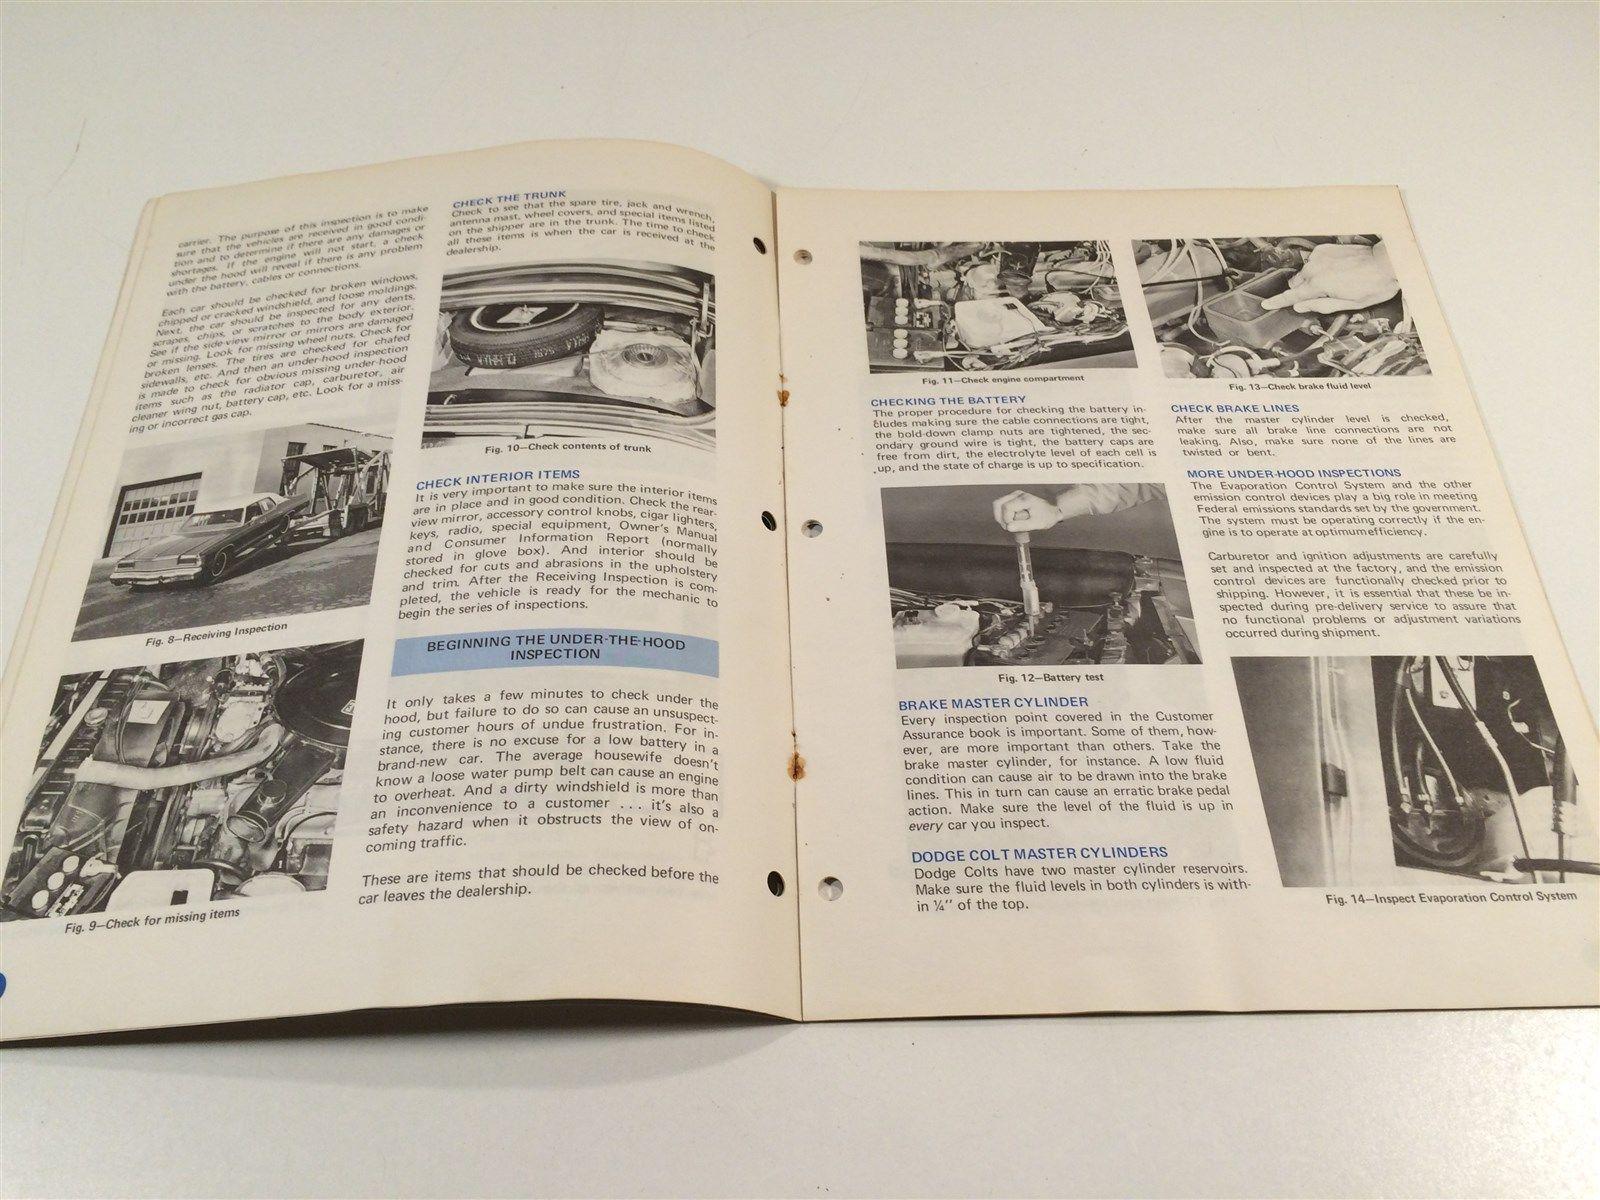 Chrysler Master Technicians Service Reference Book 758 75 8 Customer Assurance